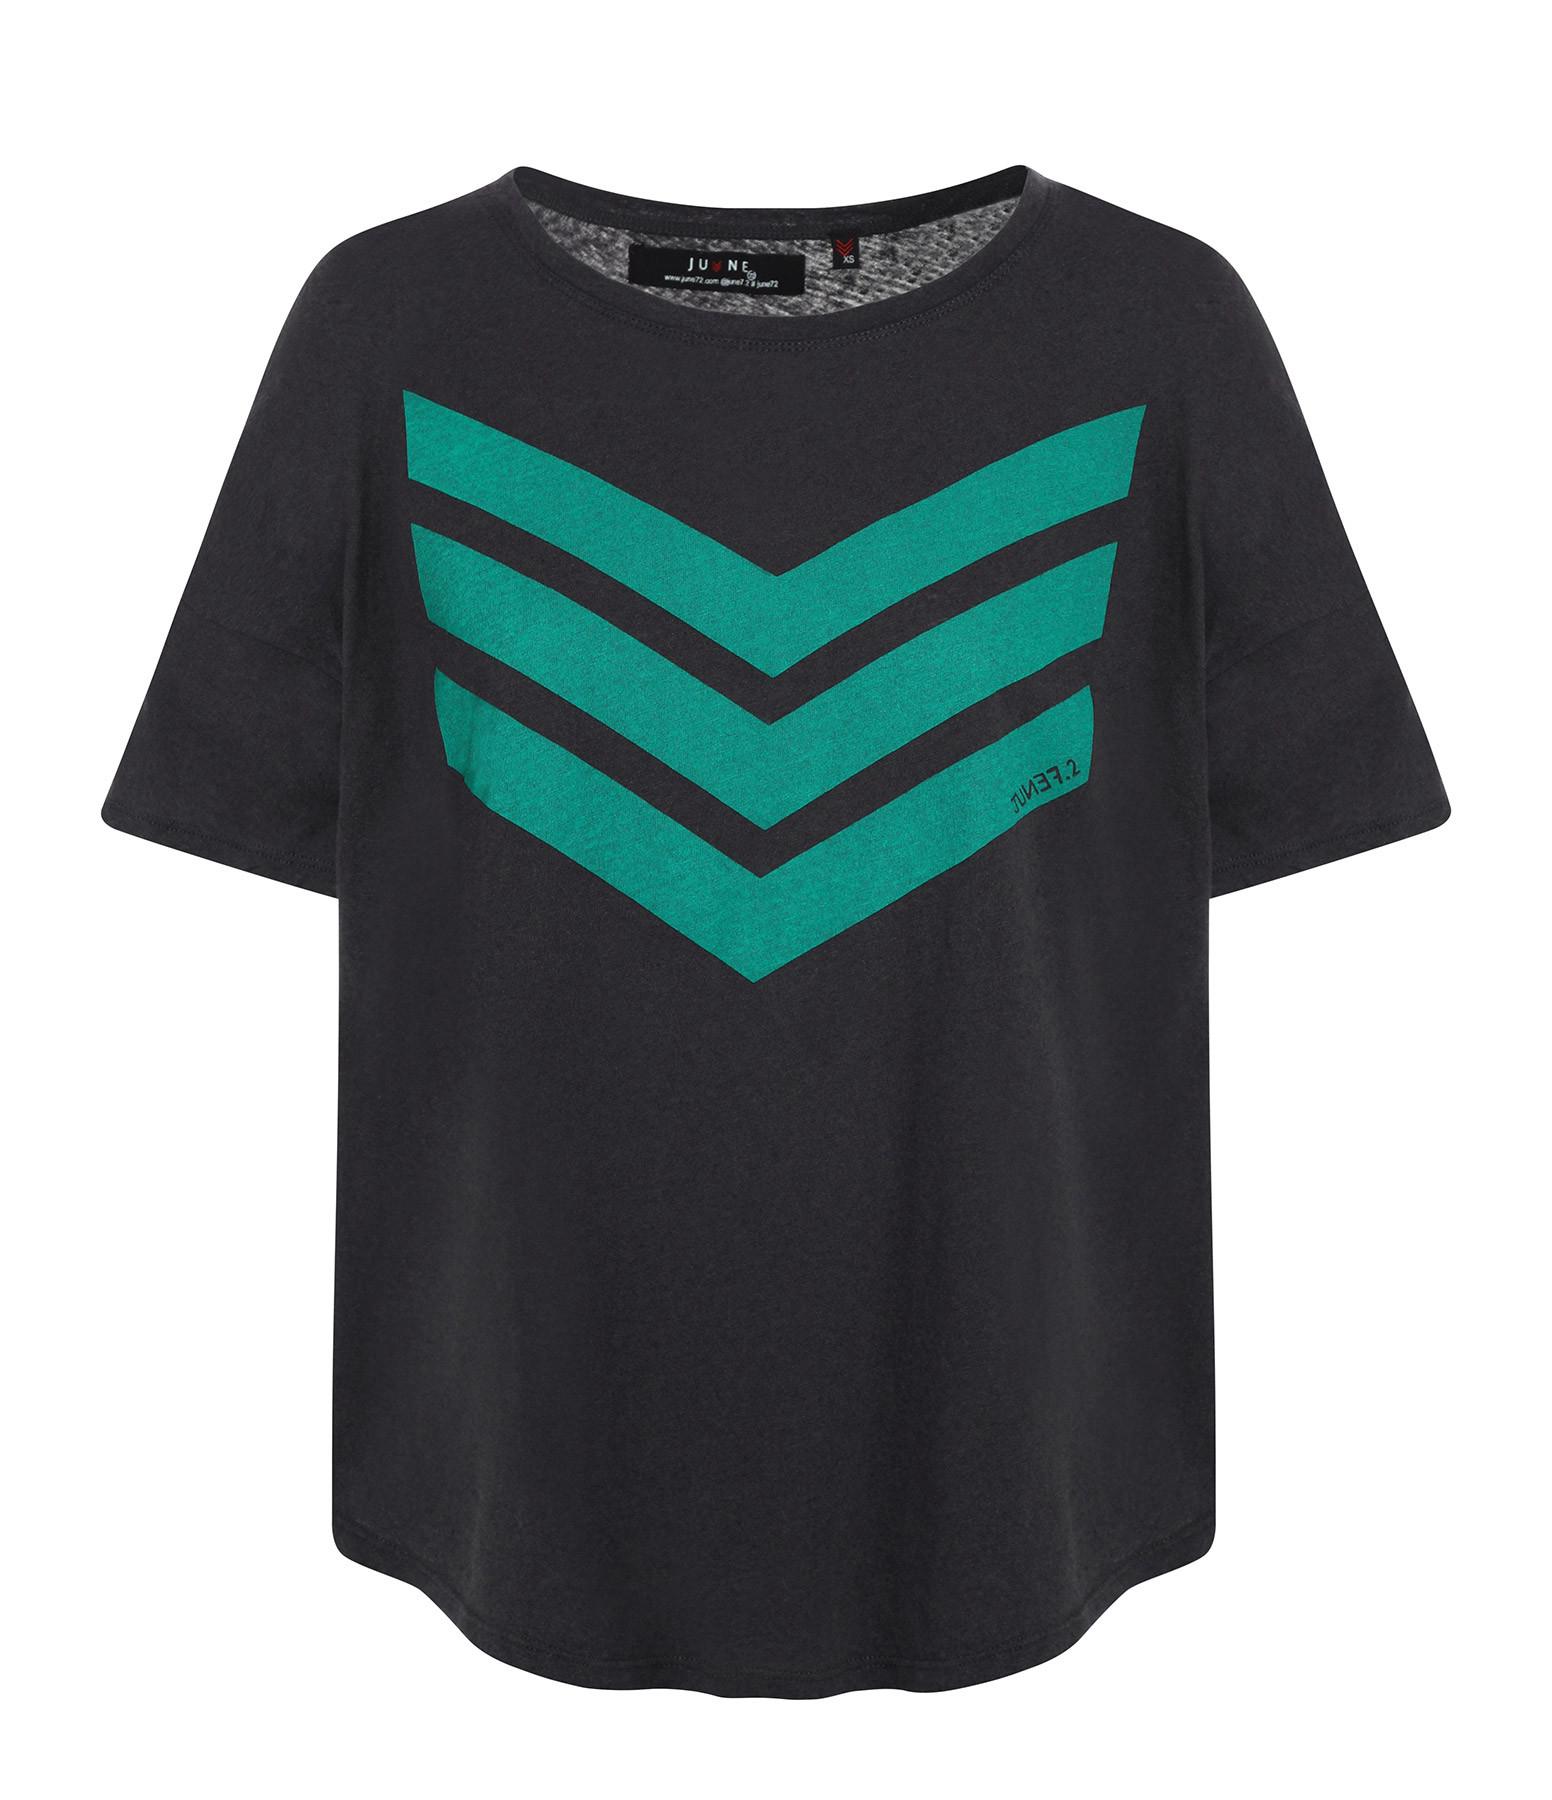 JUNE 7.2 - Tee-shirt Uma Coton Lin Charbon Logo Vert